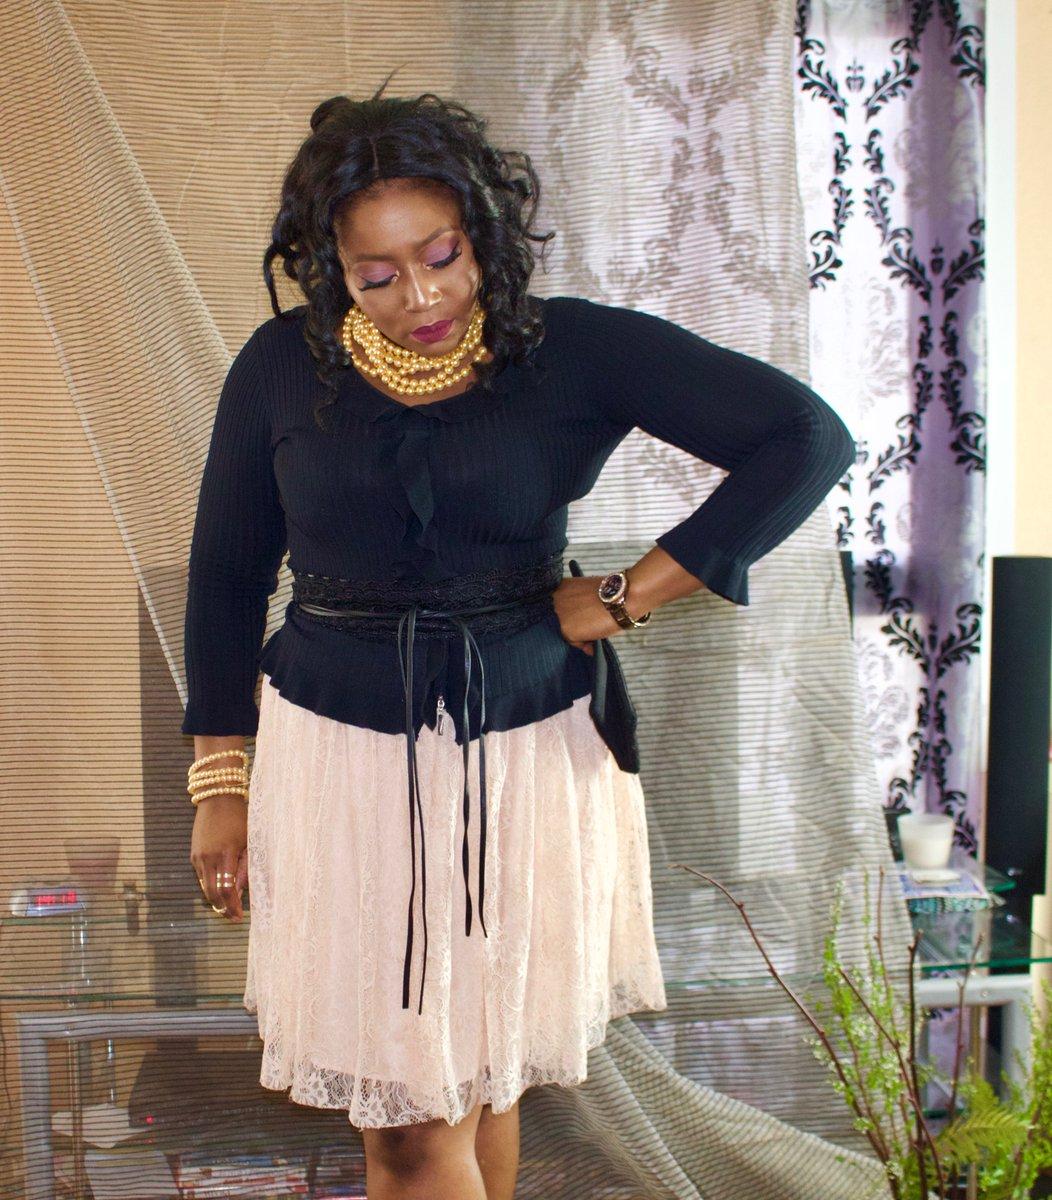 GOING BLUSH FOR EASTER On the blog  https:// juliettsstyle.blogspot.com  &nbsp;   #blush #Easterstyle #fashionblogger #styleoftheday <br>http://pic.twitter.com/mFI1YrHhmI